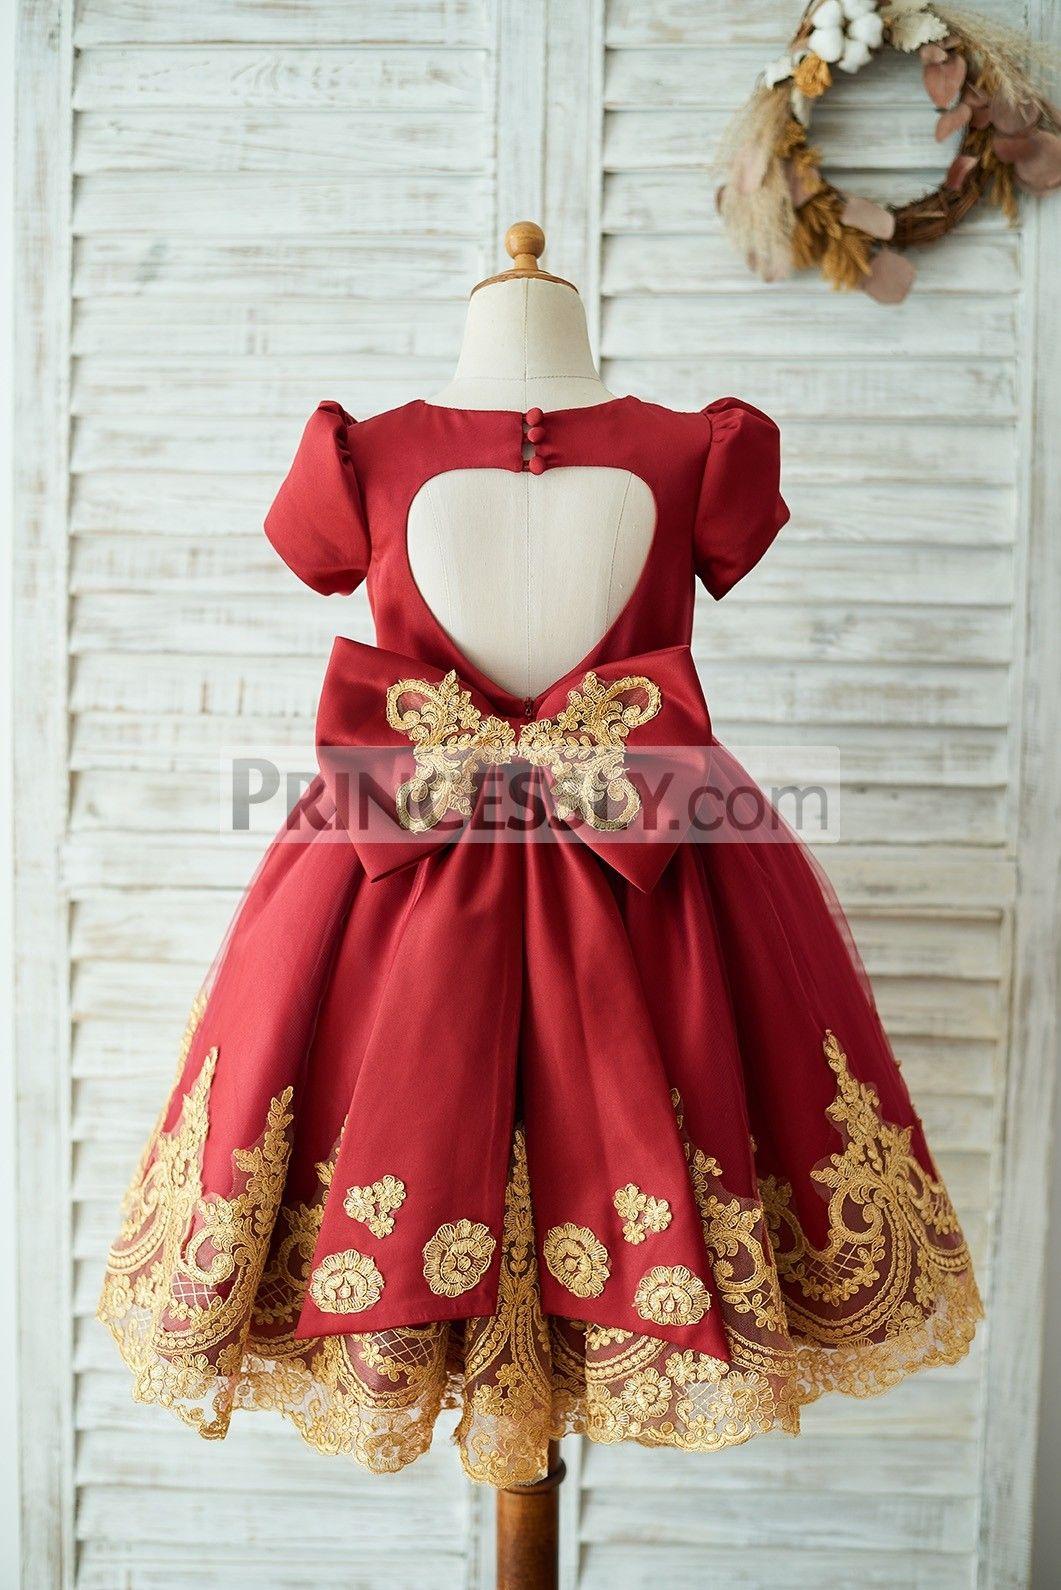 8878e070e Red Satin Gold Lace Short Sleeves Keyhole Back Wedding Flower Girl ...